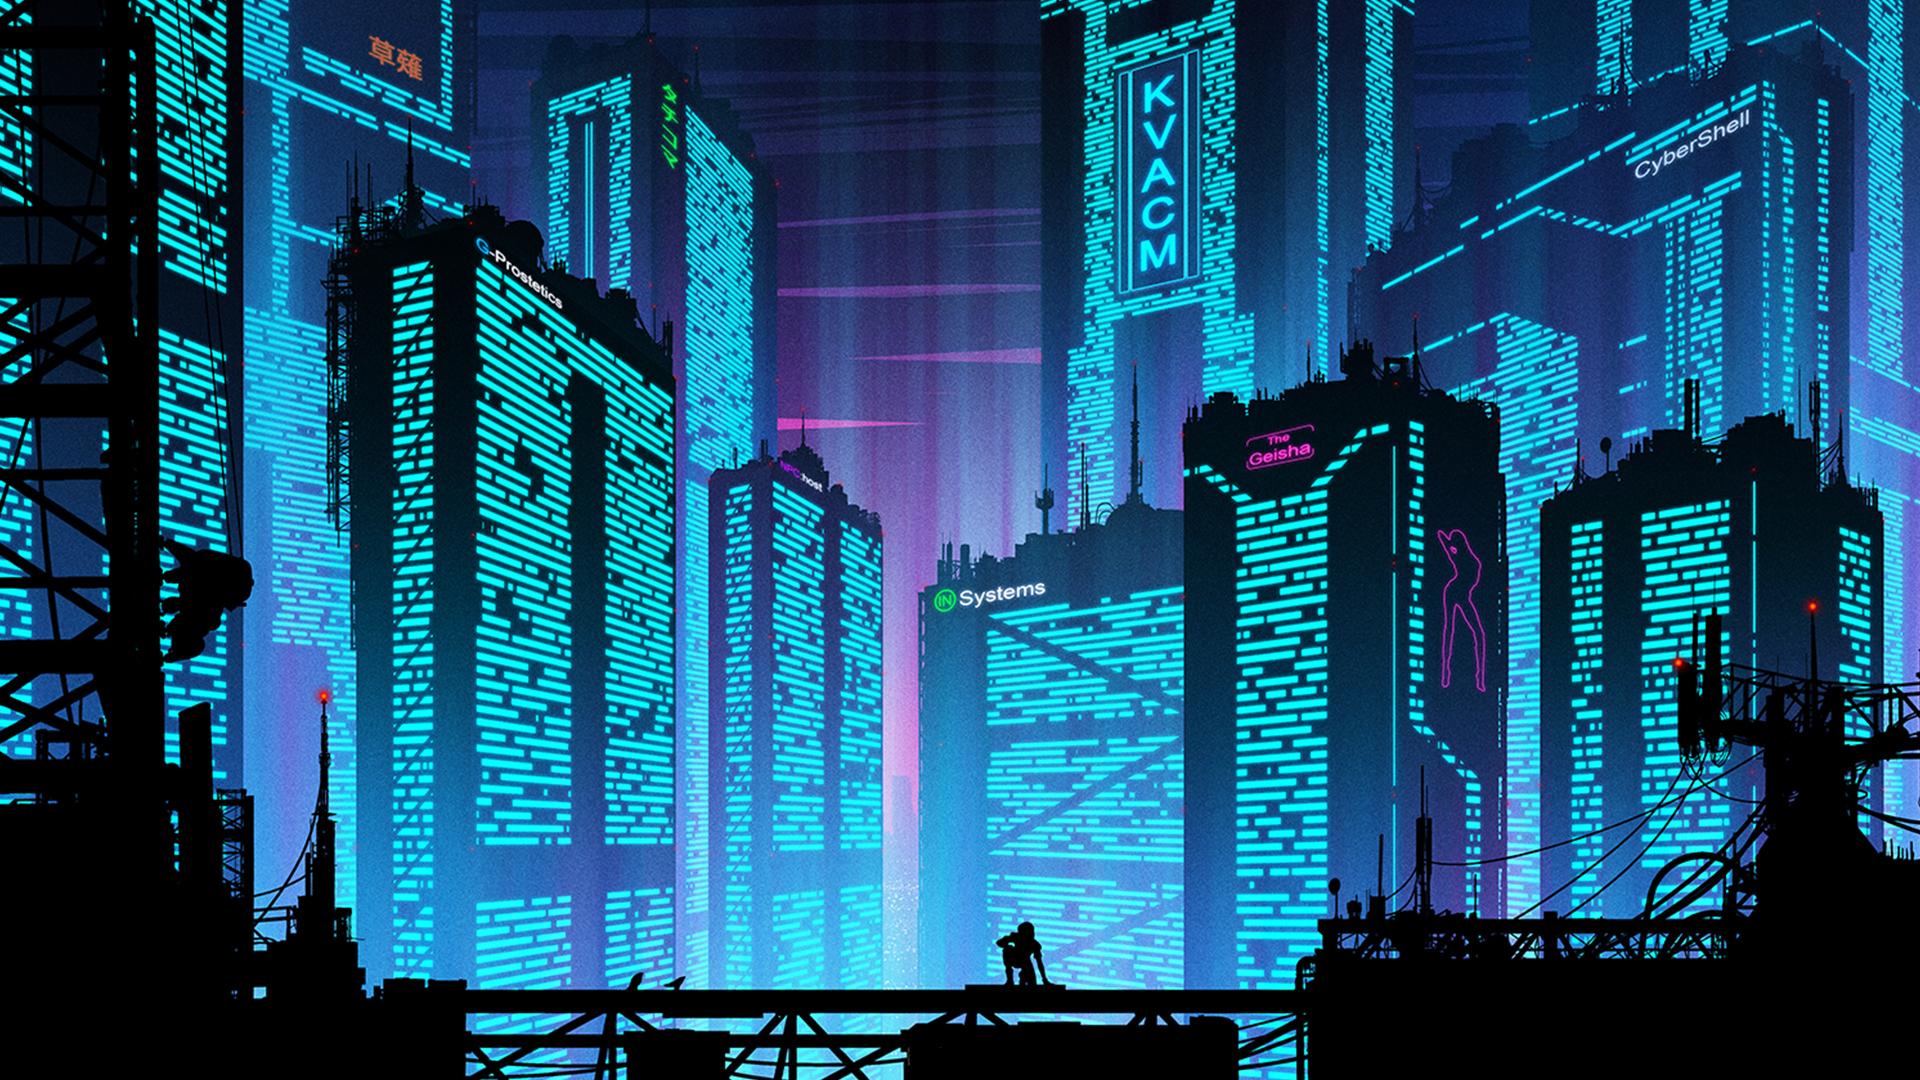 Cyberpunk Futuristic New Port City Wallpaper, HD City 4K ...